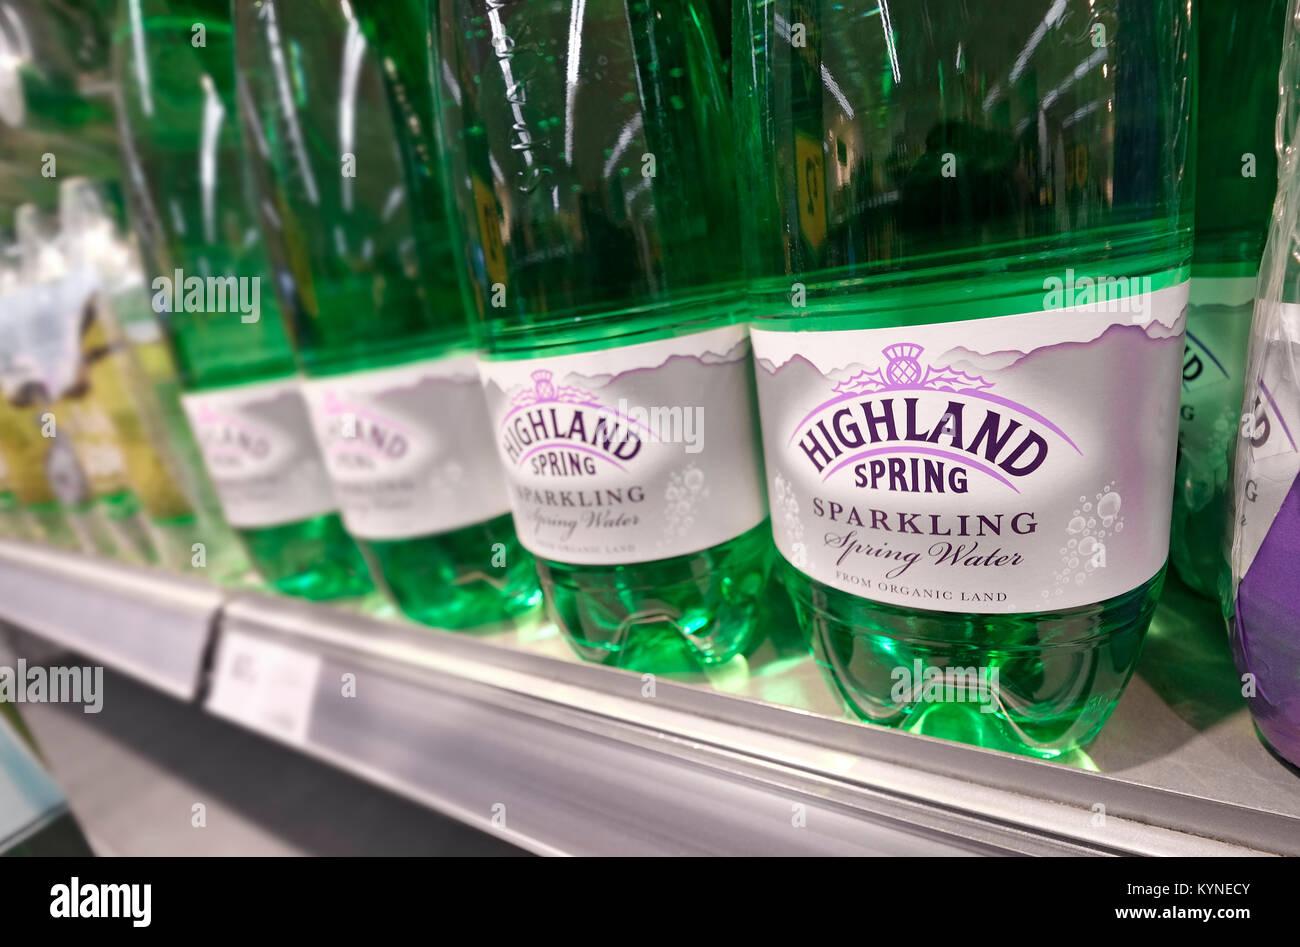 Bottles of water shelf stock photos bottles of water shelf stock highland spring water in green plastic bottles on supermarket shelf stock image biocorpaavc